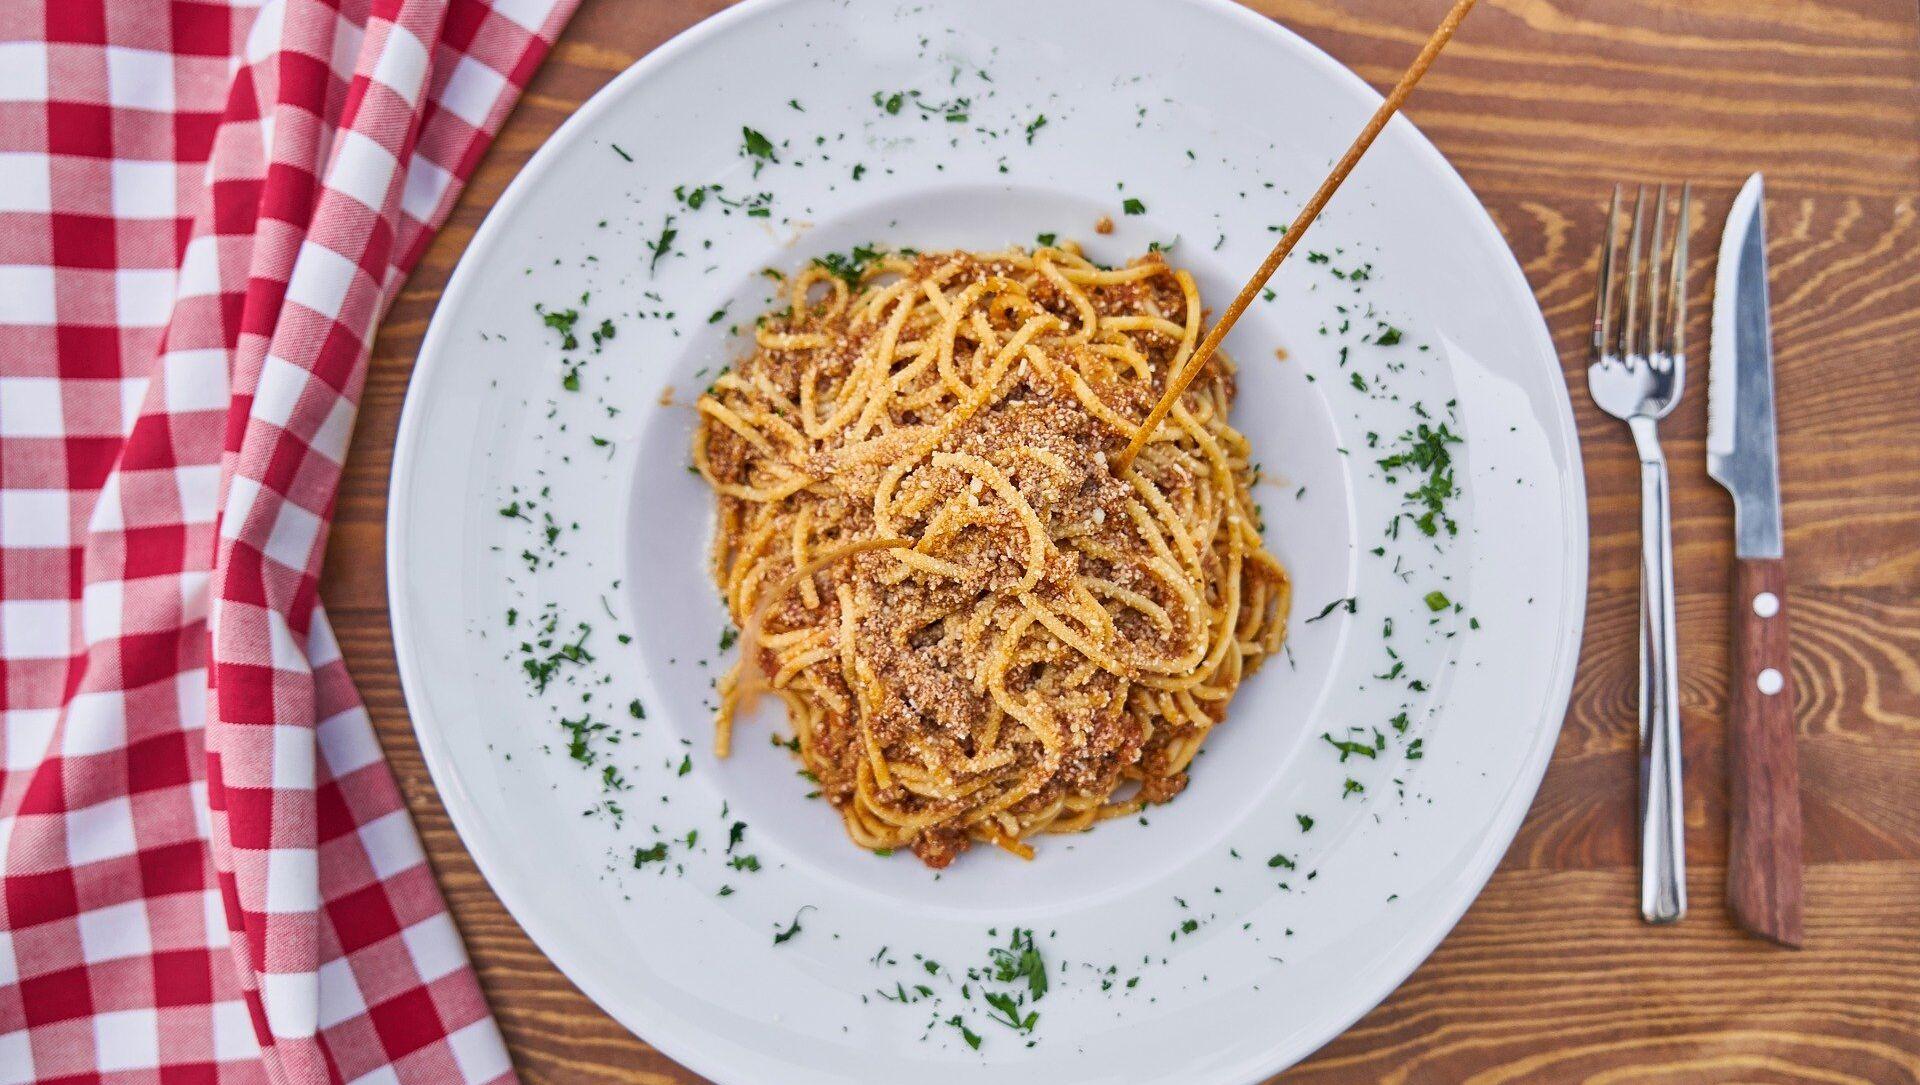 A plate of pasta - Sputnik Italia, 1920, 25.02.2021